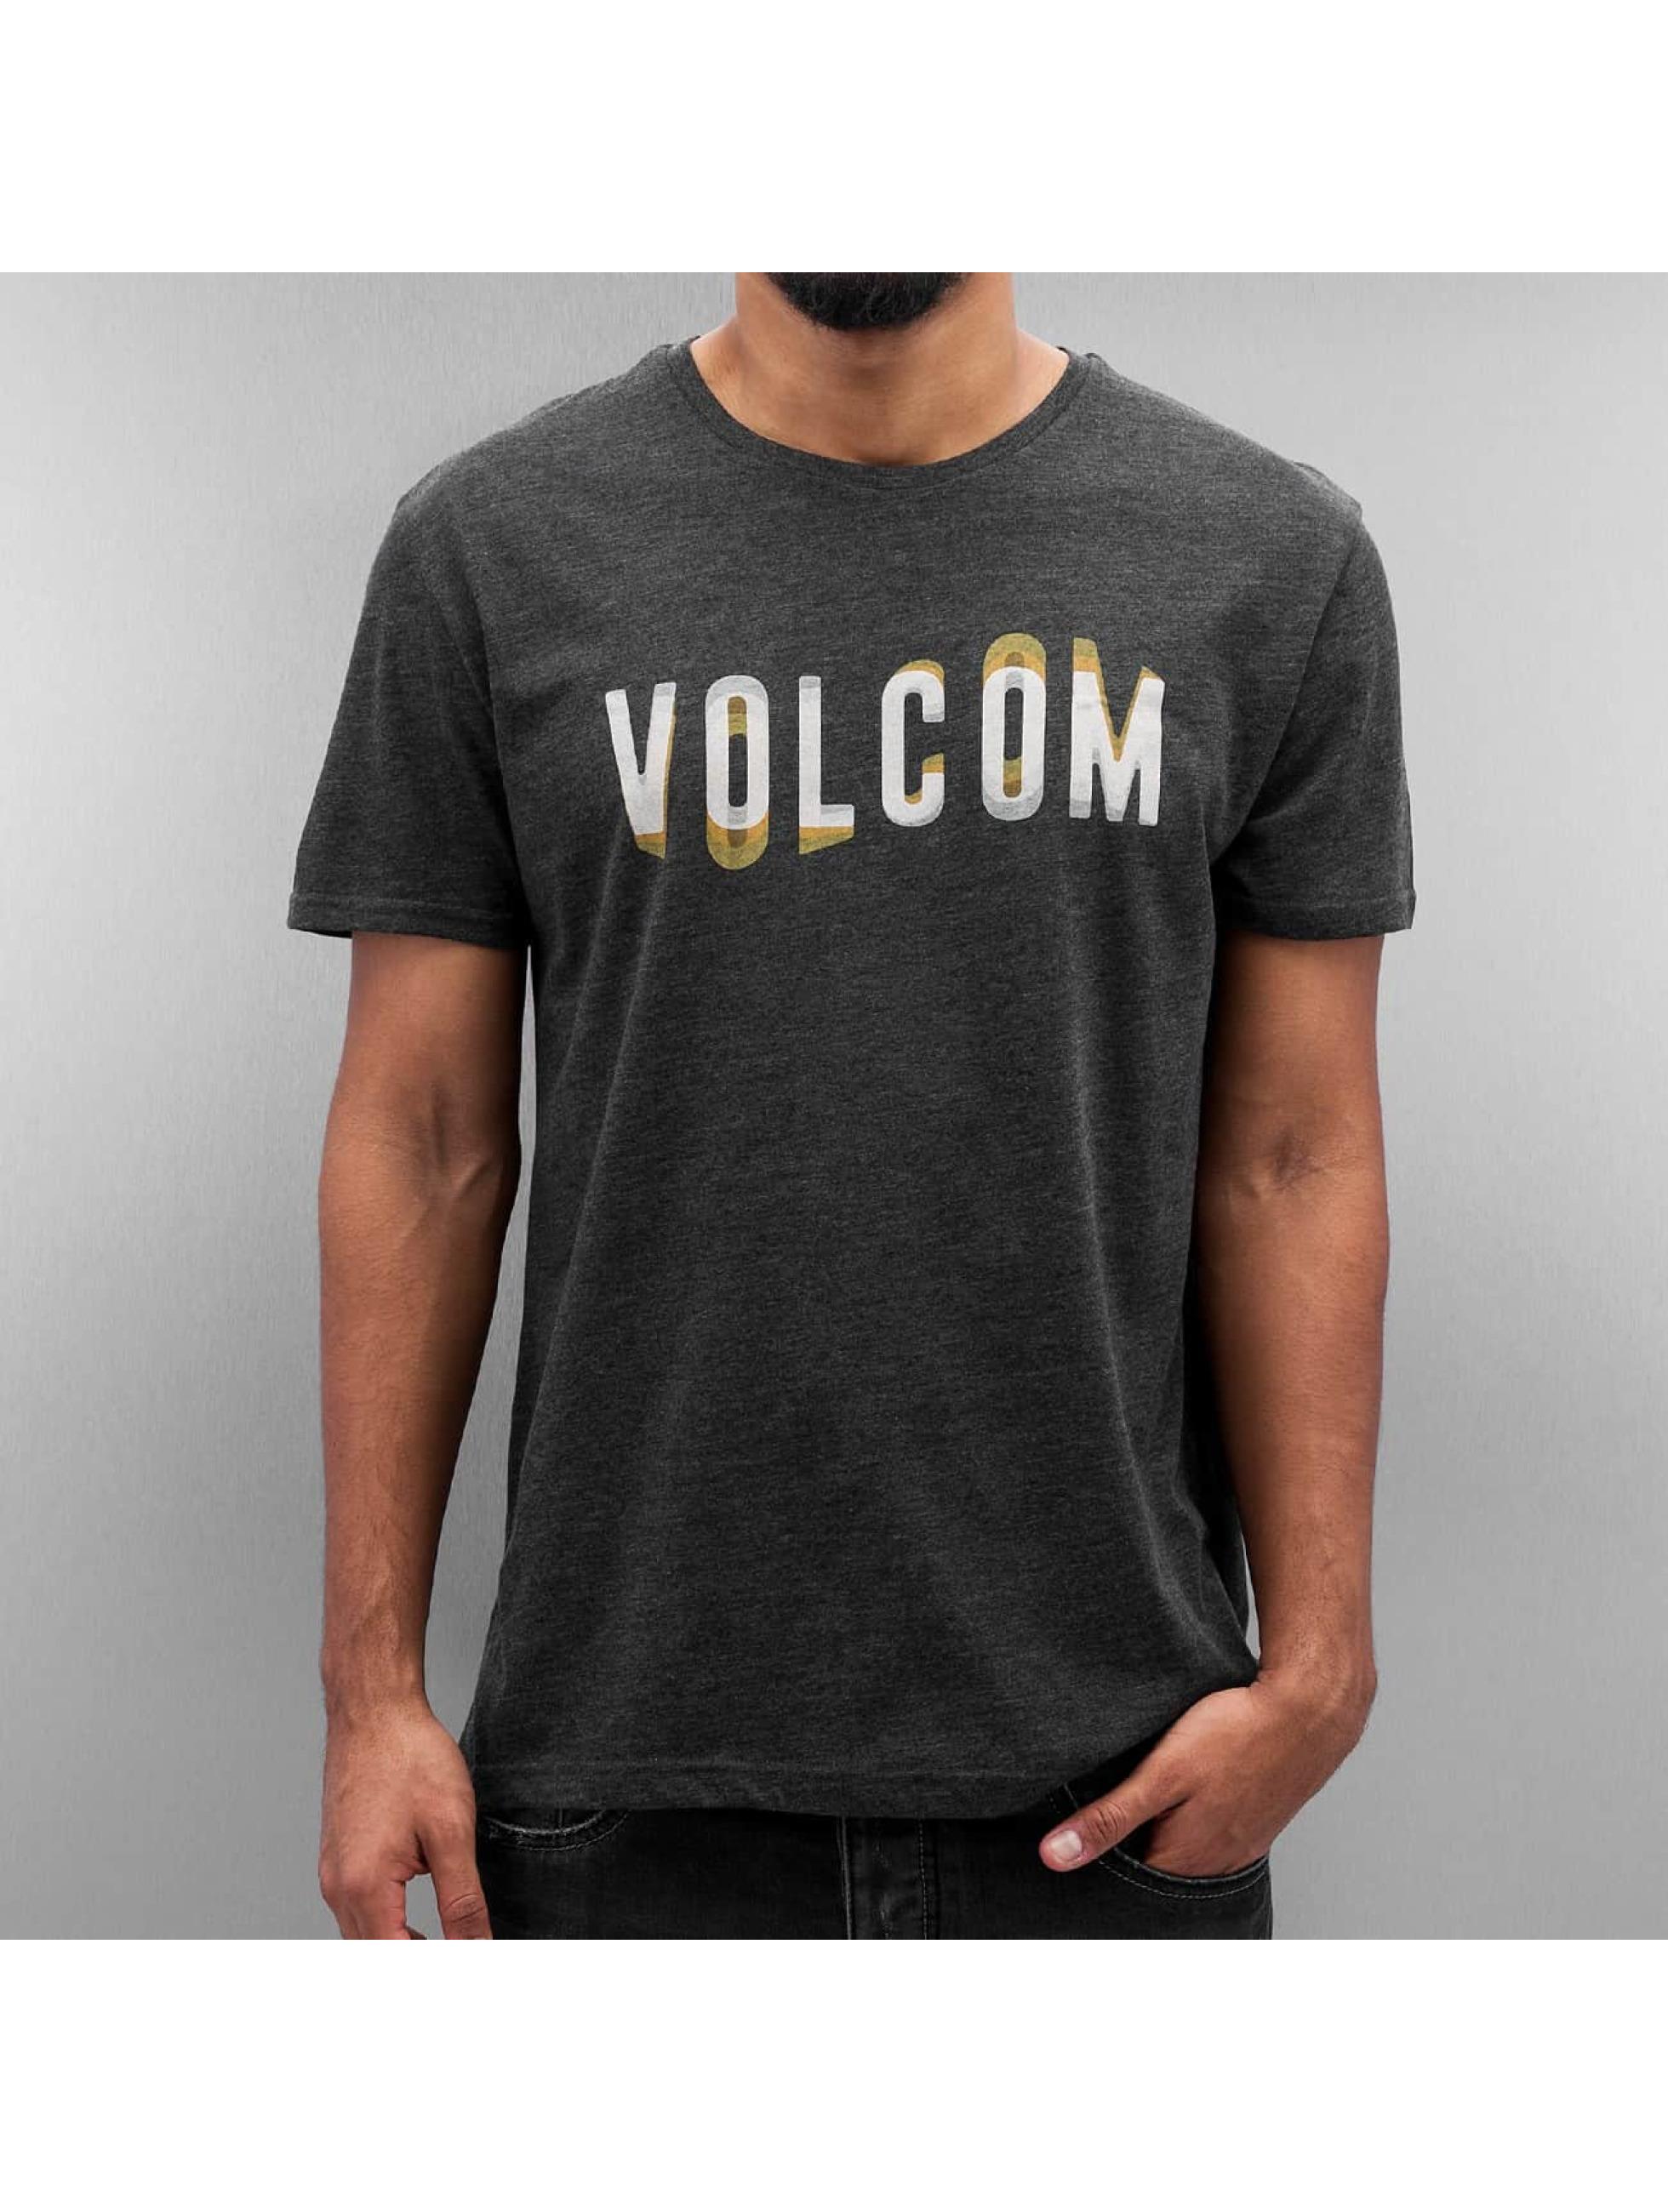 Volcom T-Shirt Warble black